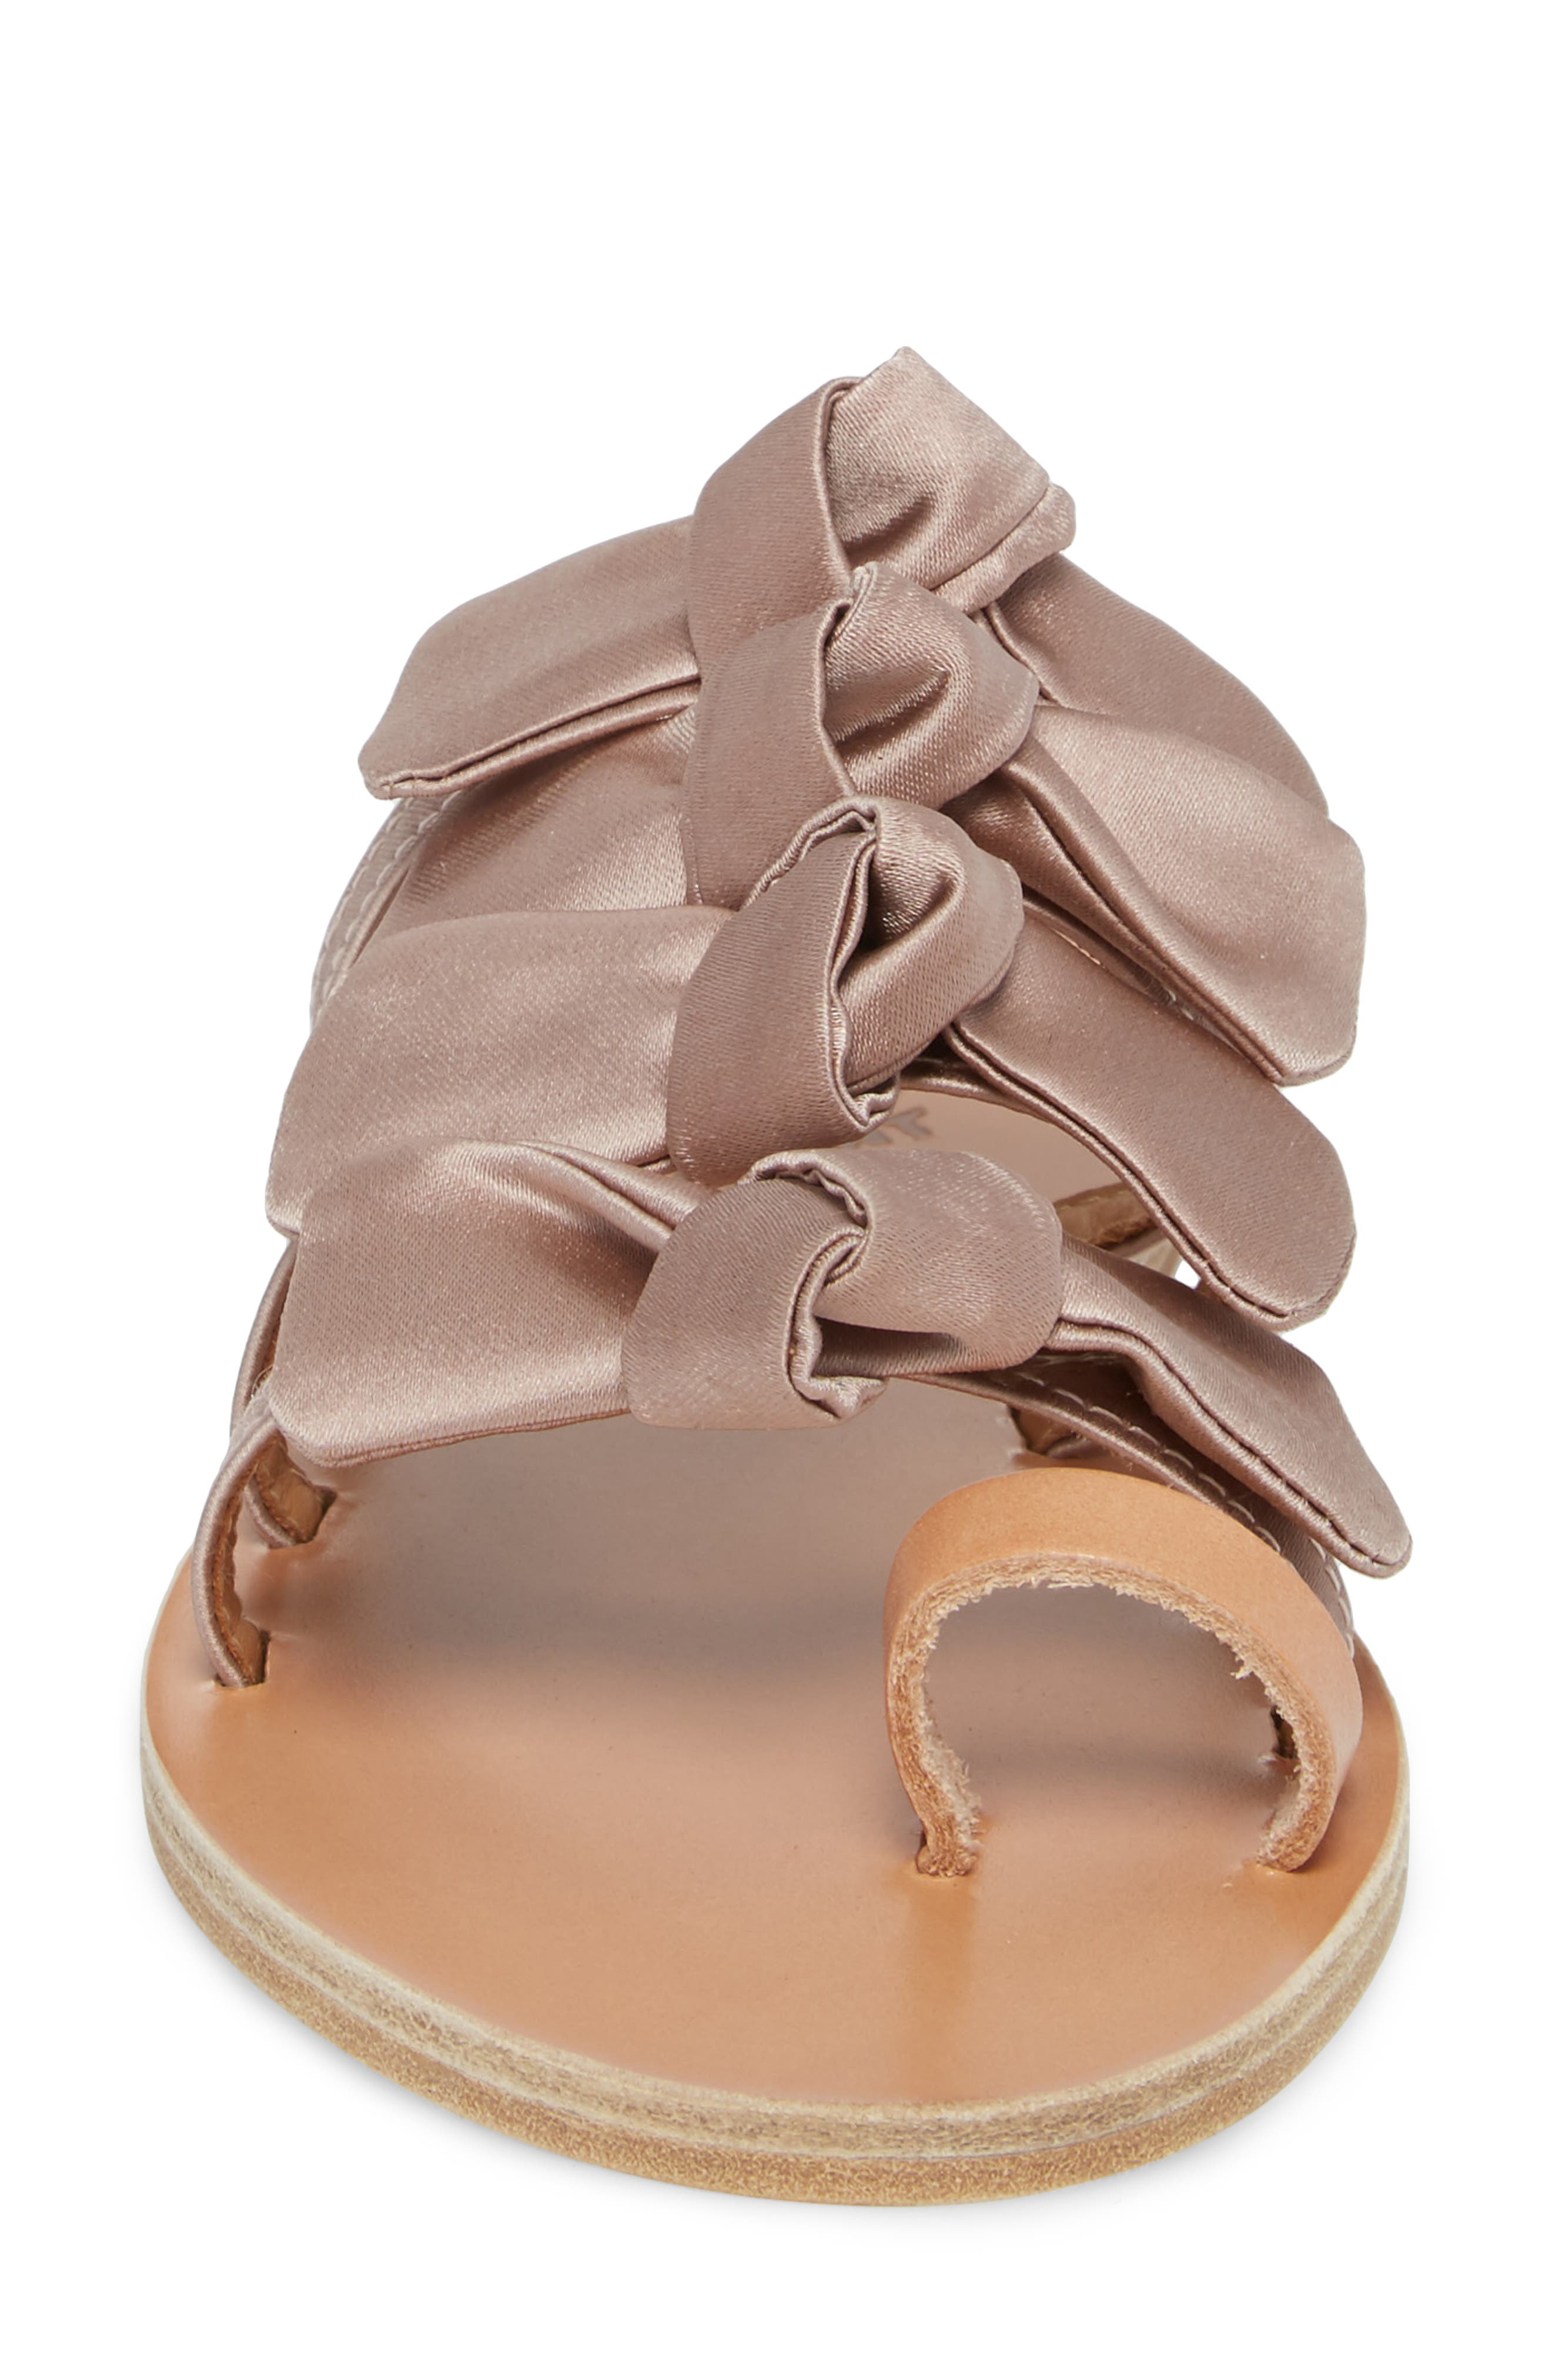 Hara Toe Loop Slide Sandal,                             Alternate thumbnail 4, color,                             650